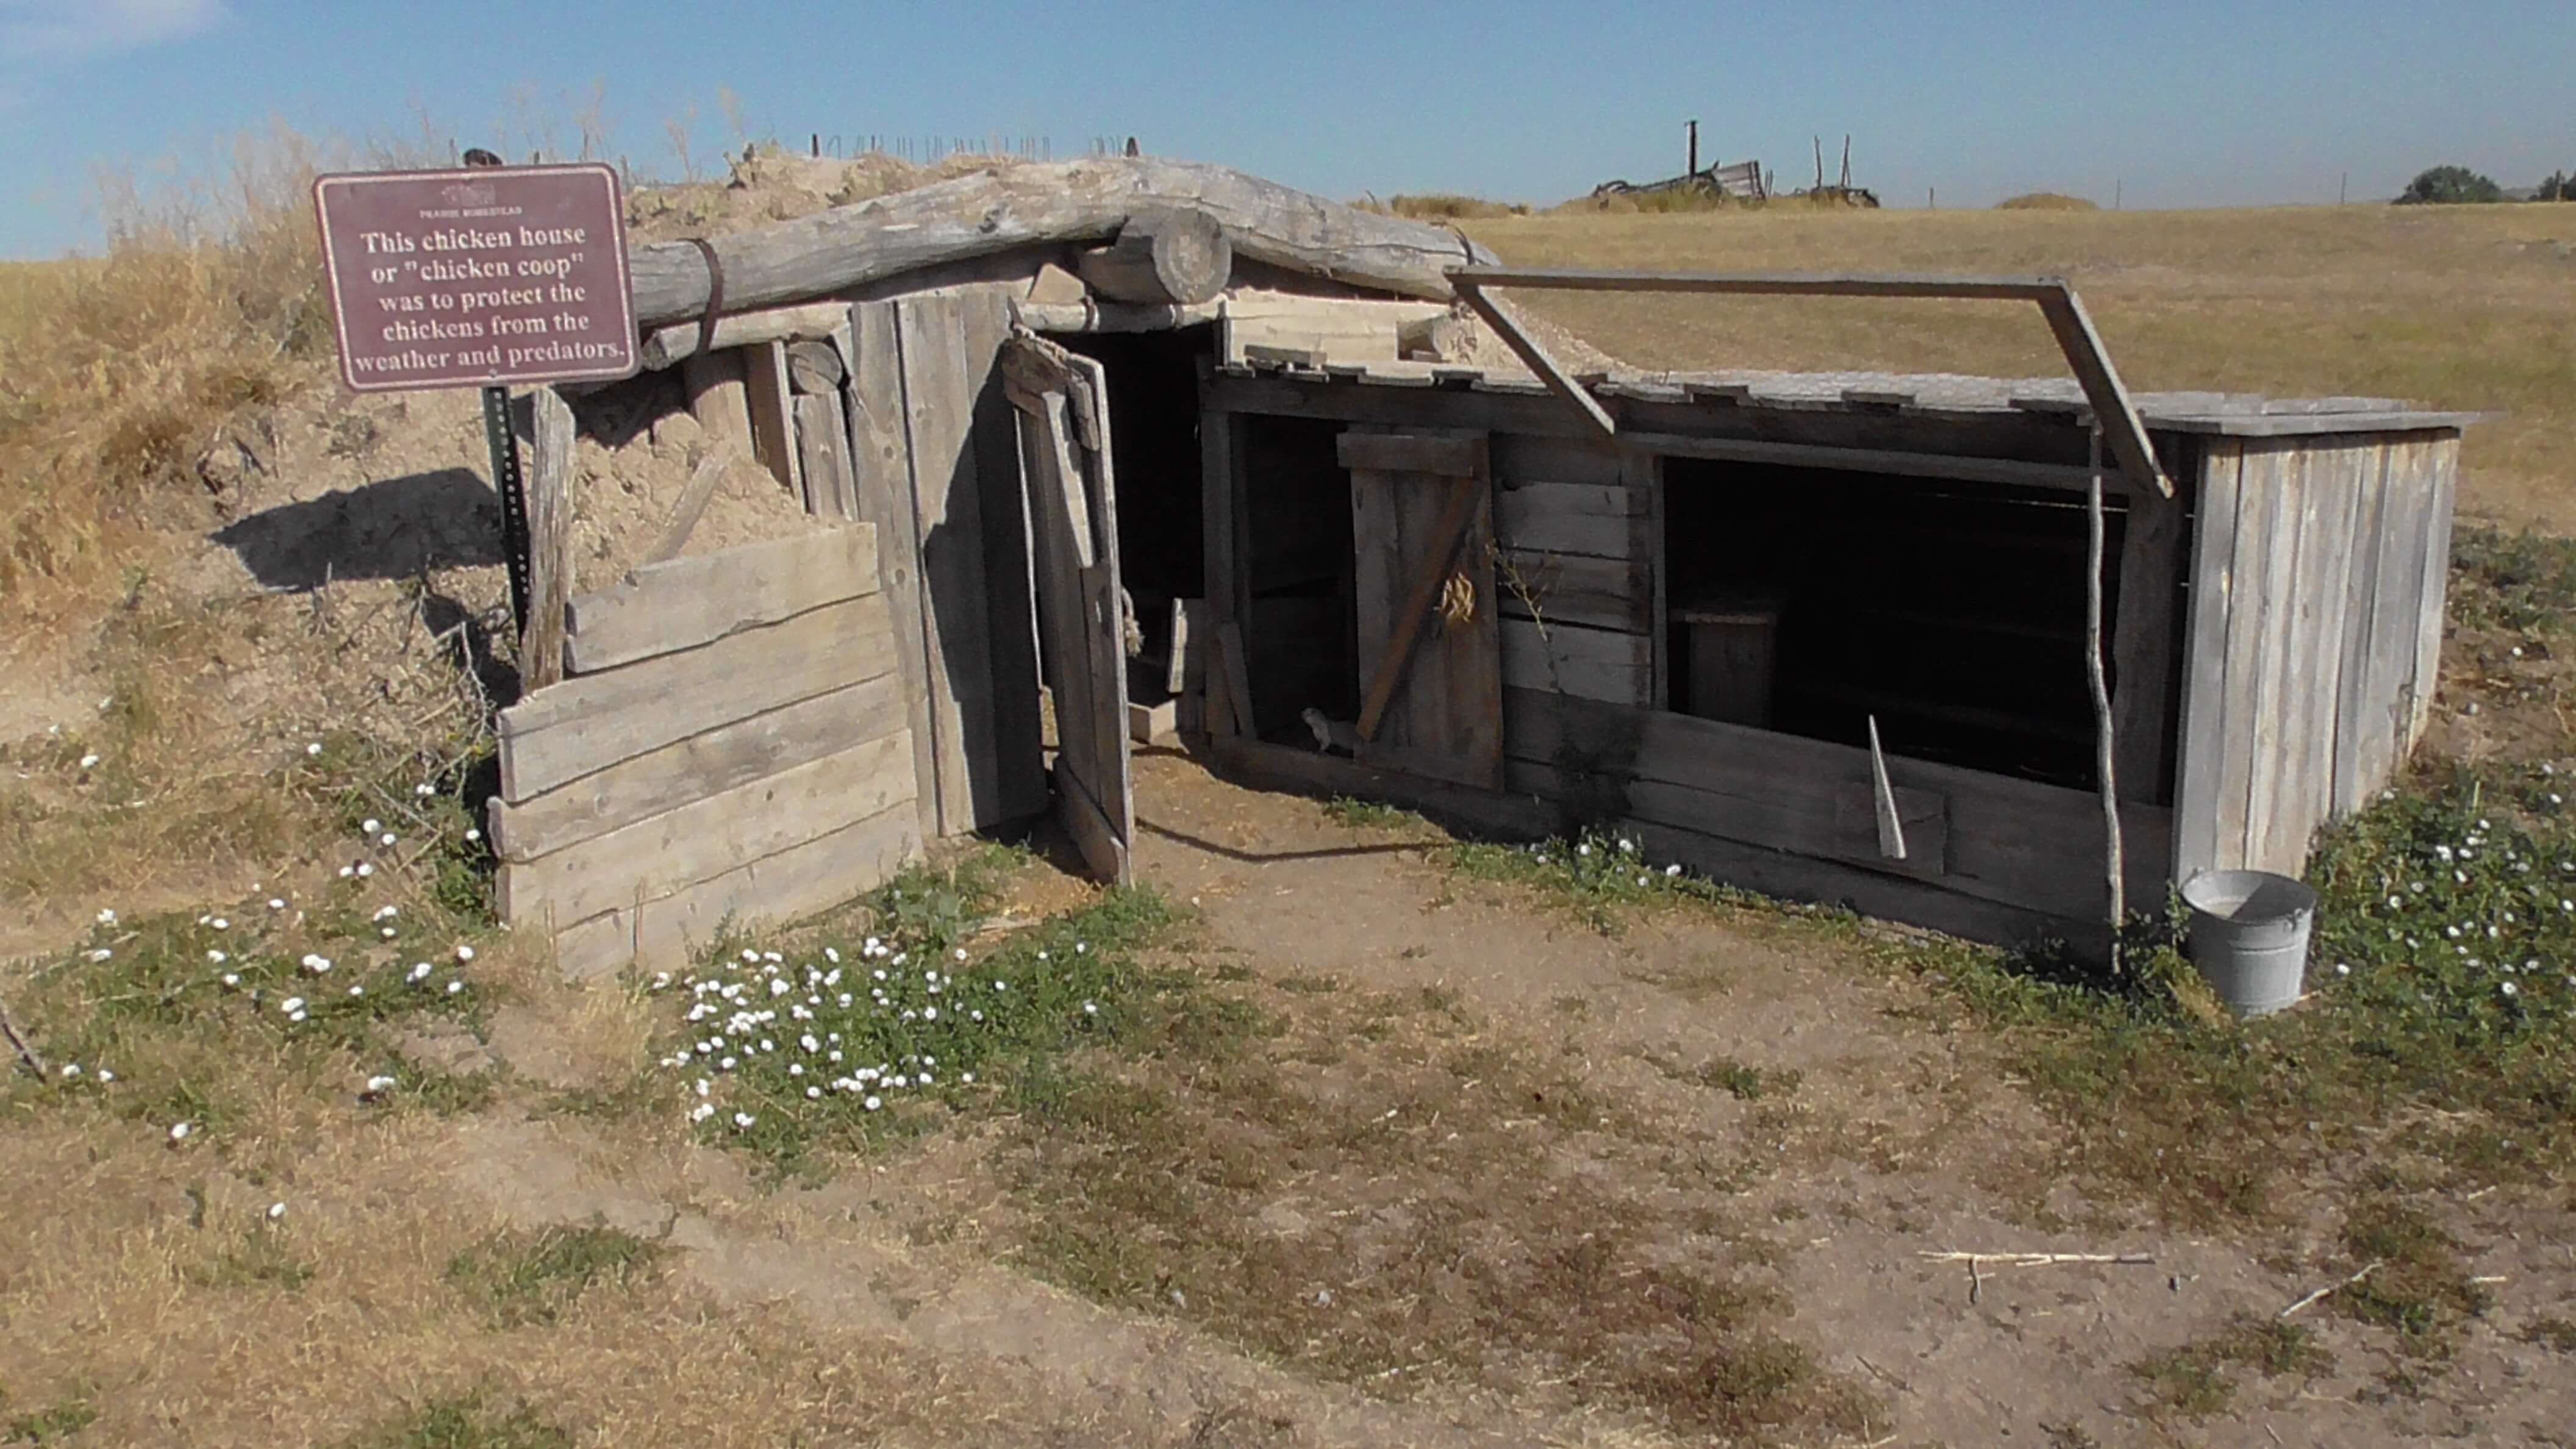 Sod Chicken House